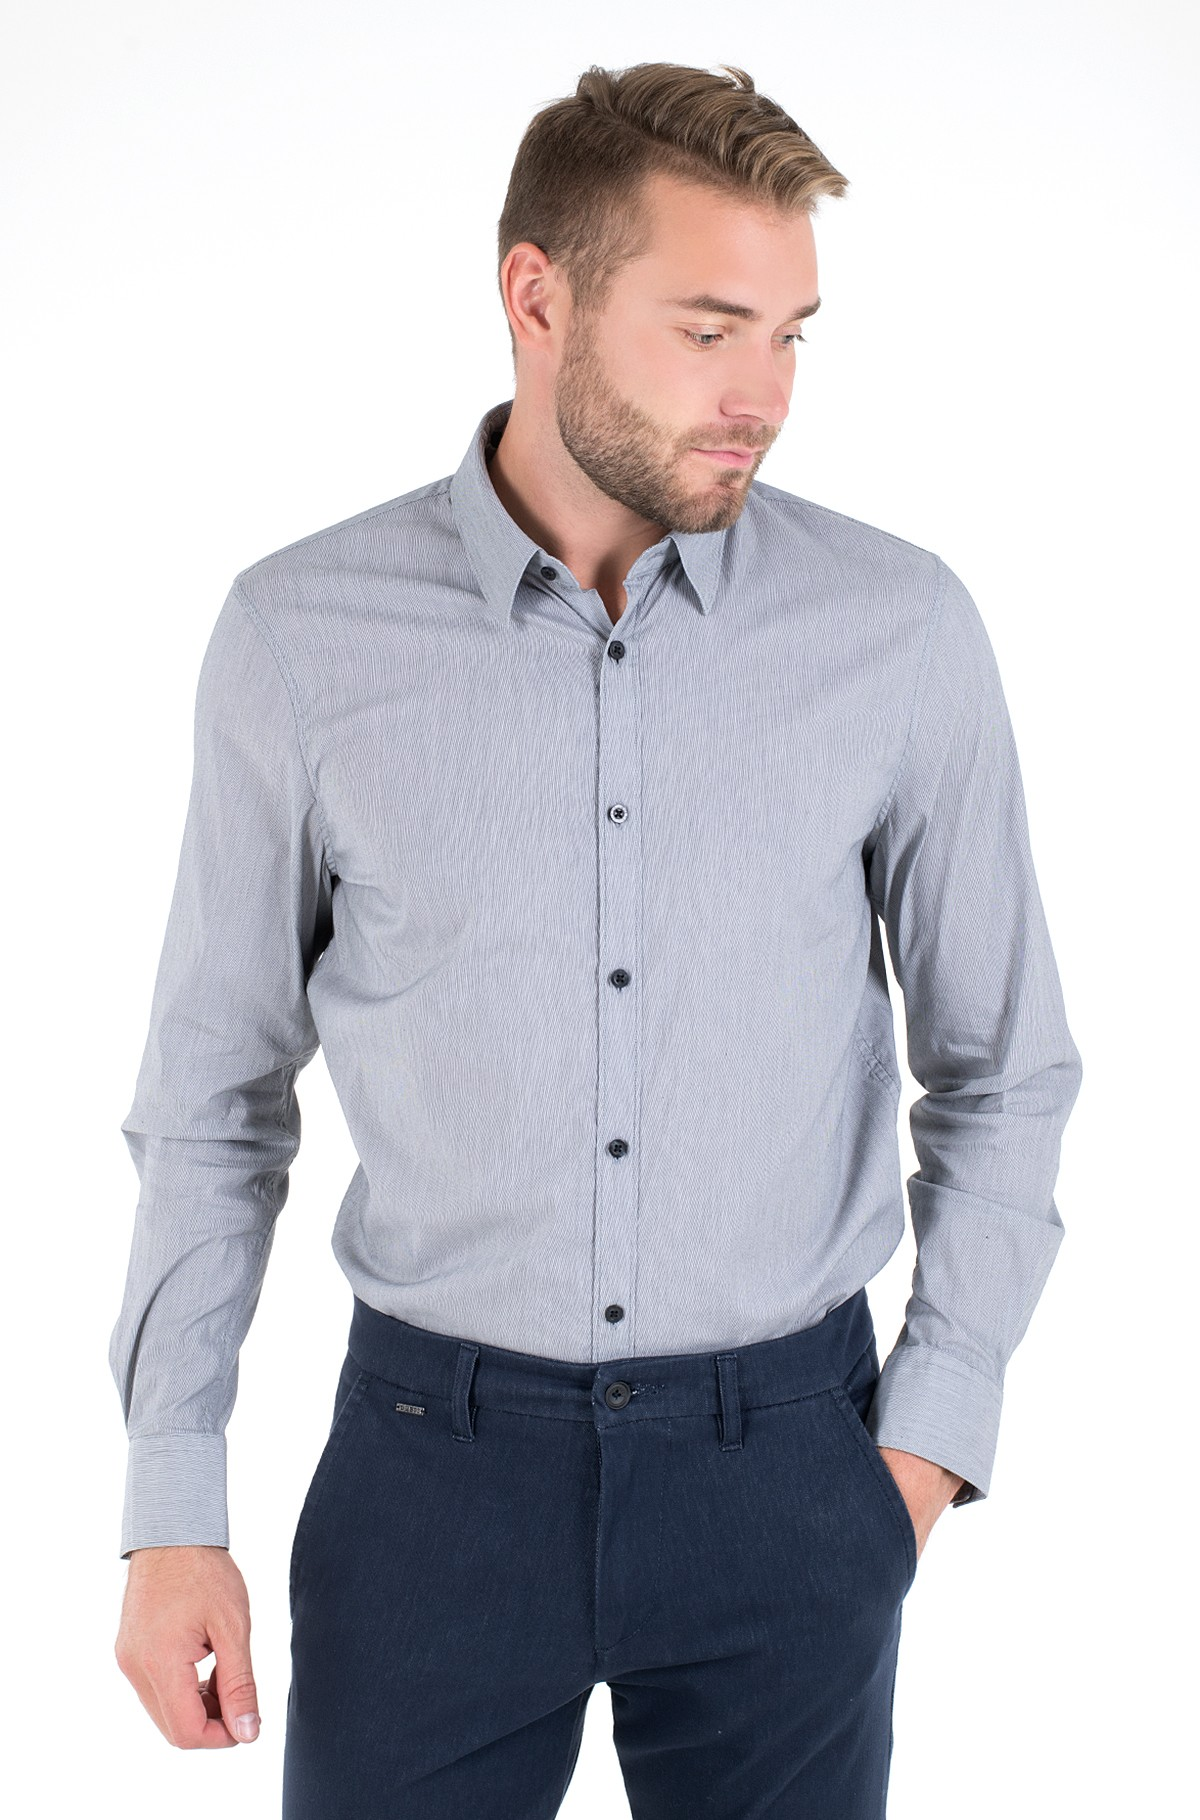 Marškiniai M0BH20 WDBR0-full-1